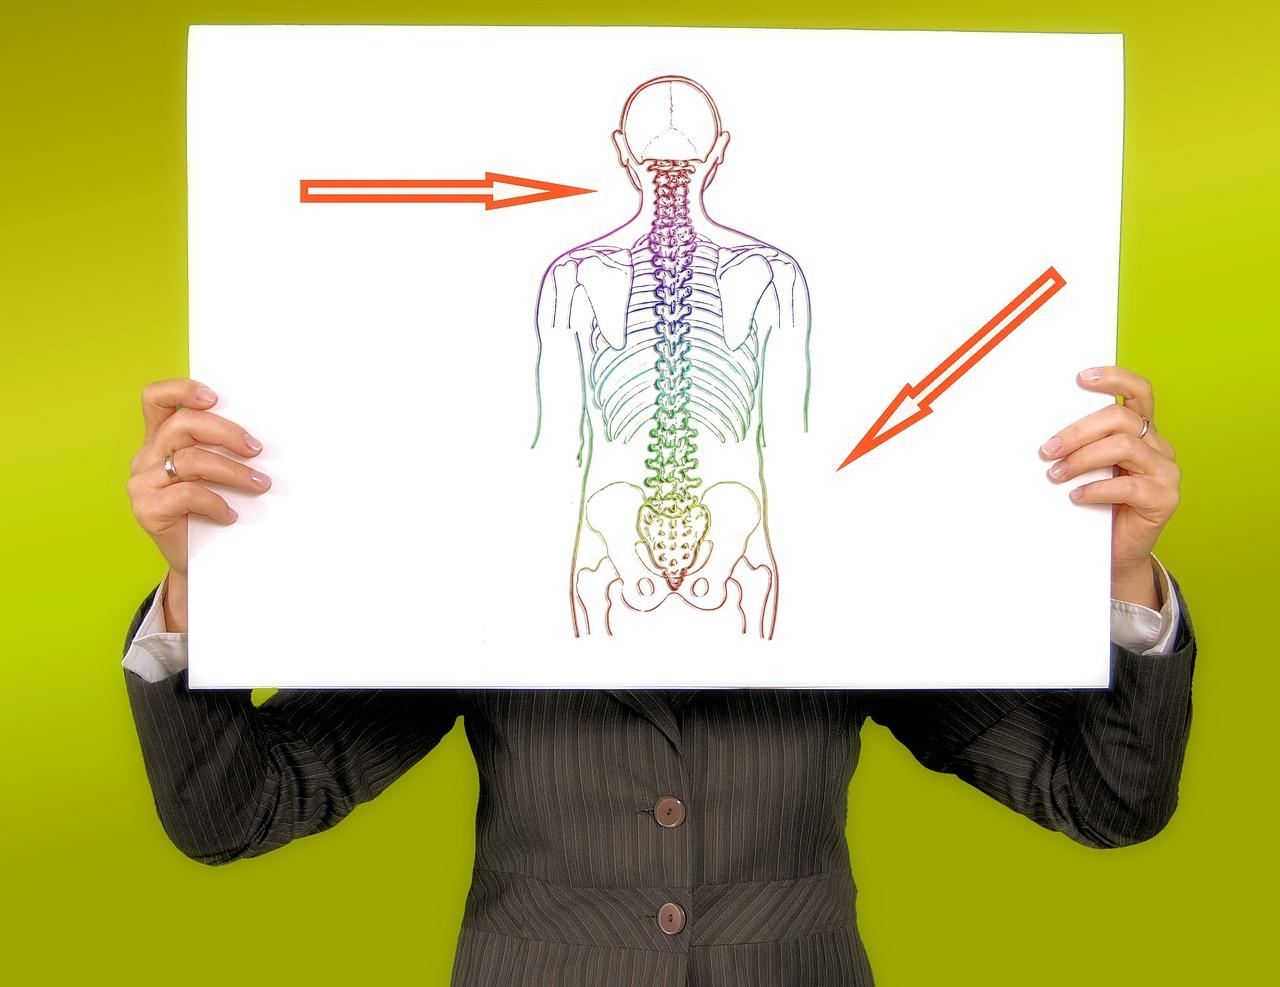 Cisto sinovial na coluna | Causas, Sintomas e Tratamento